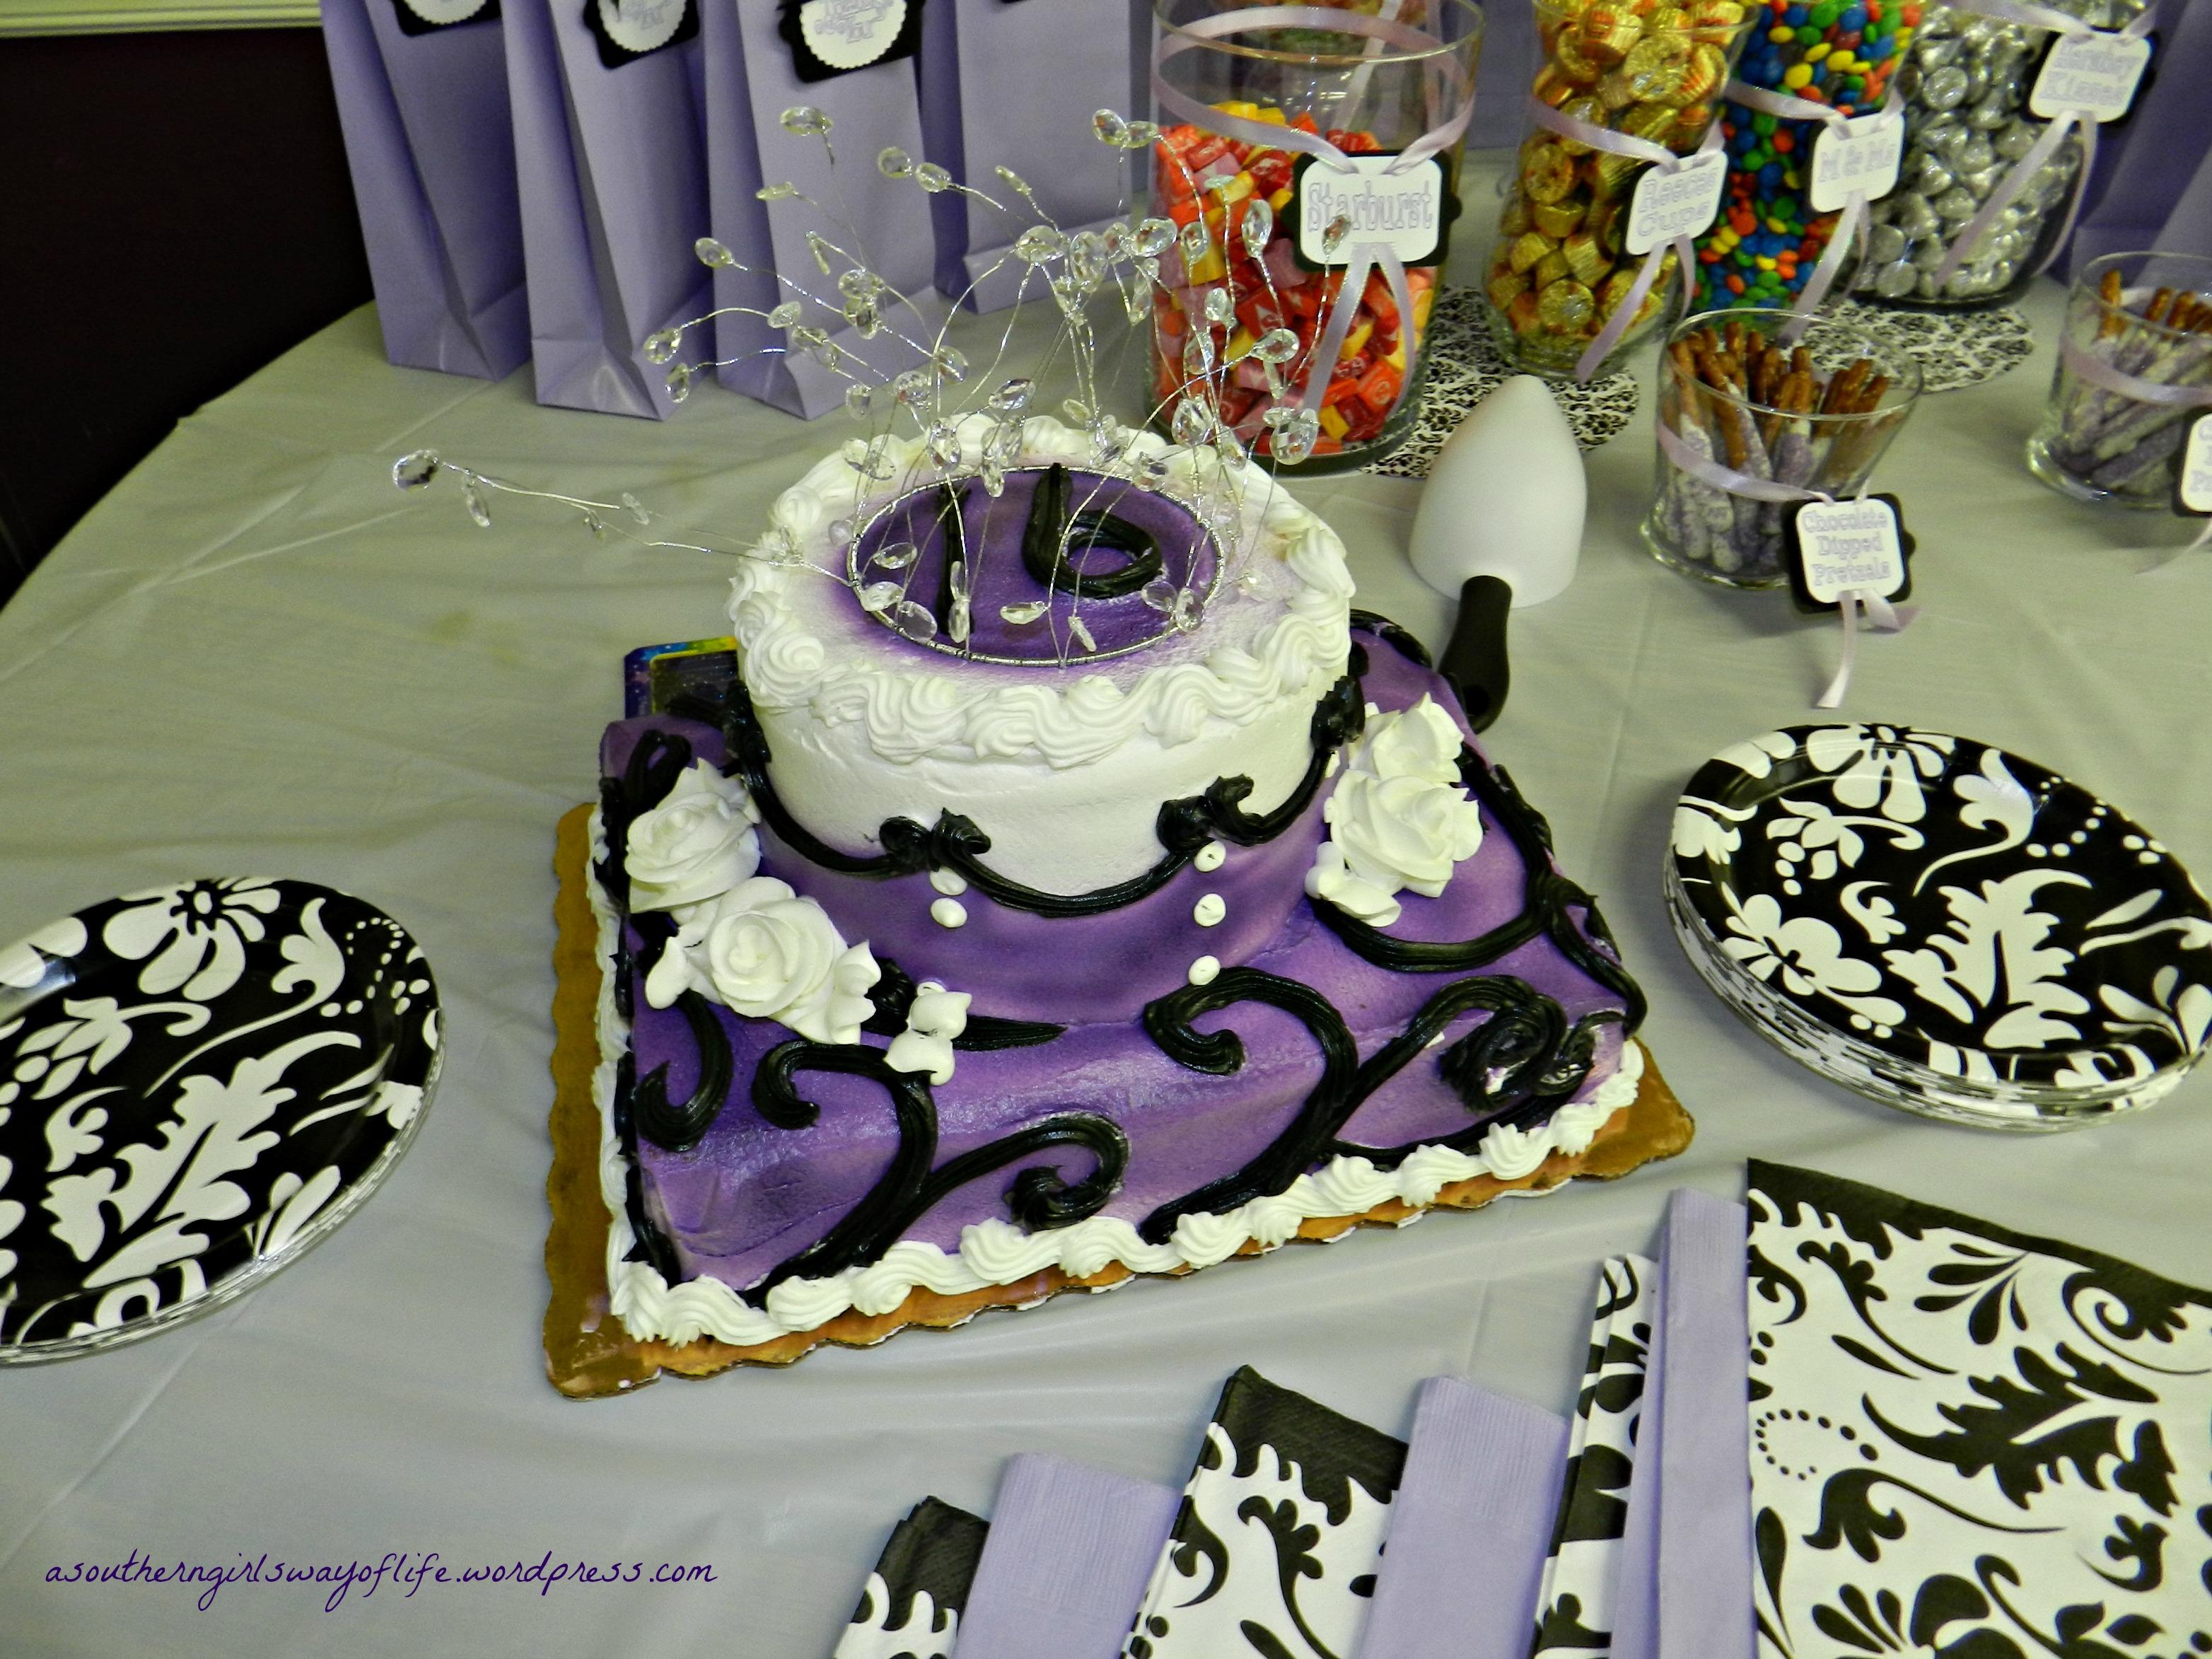 Publix Sweet 16 Birthday Cake